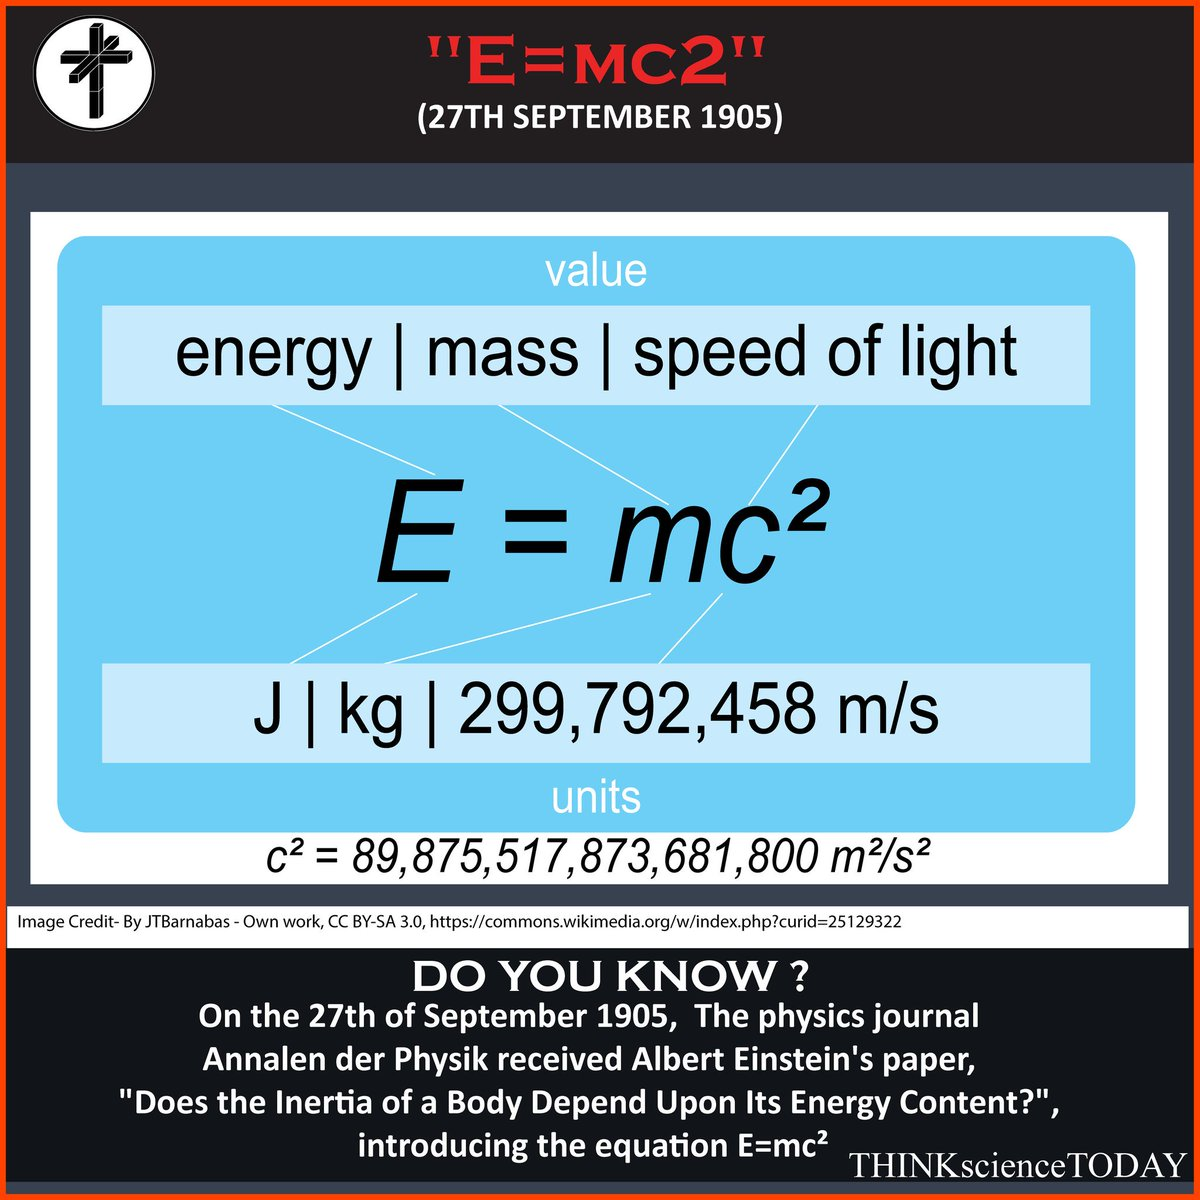 Resultado de imagen para Sept. 27, 1905, Albert Einstein€˜s paper €œDoes the Inertia of a Body Depend Upon Its Energy Content?€